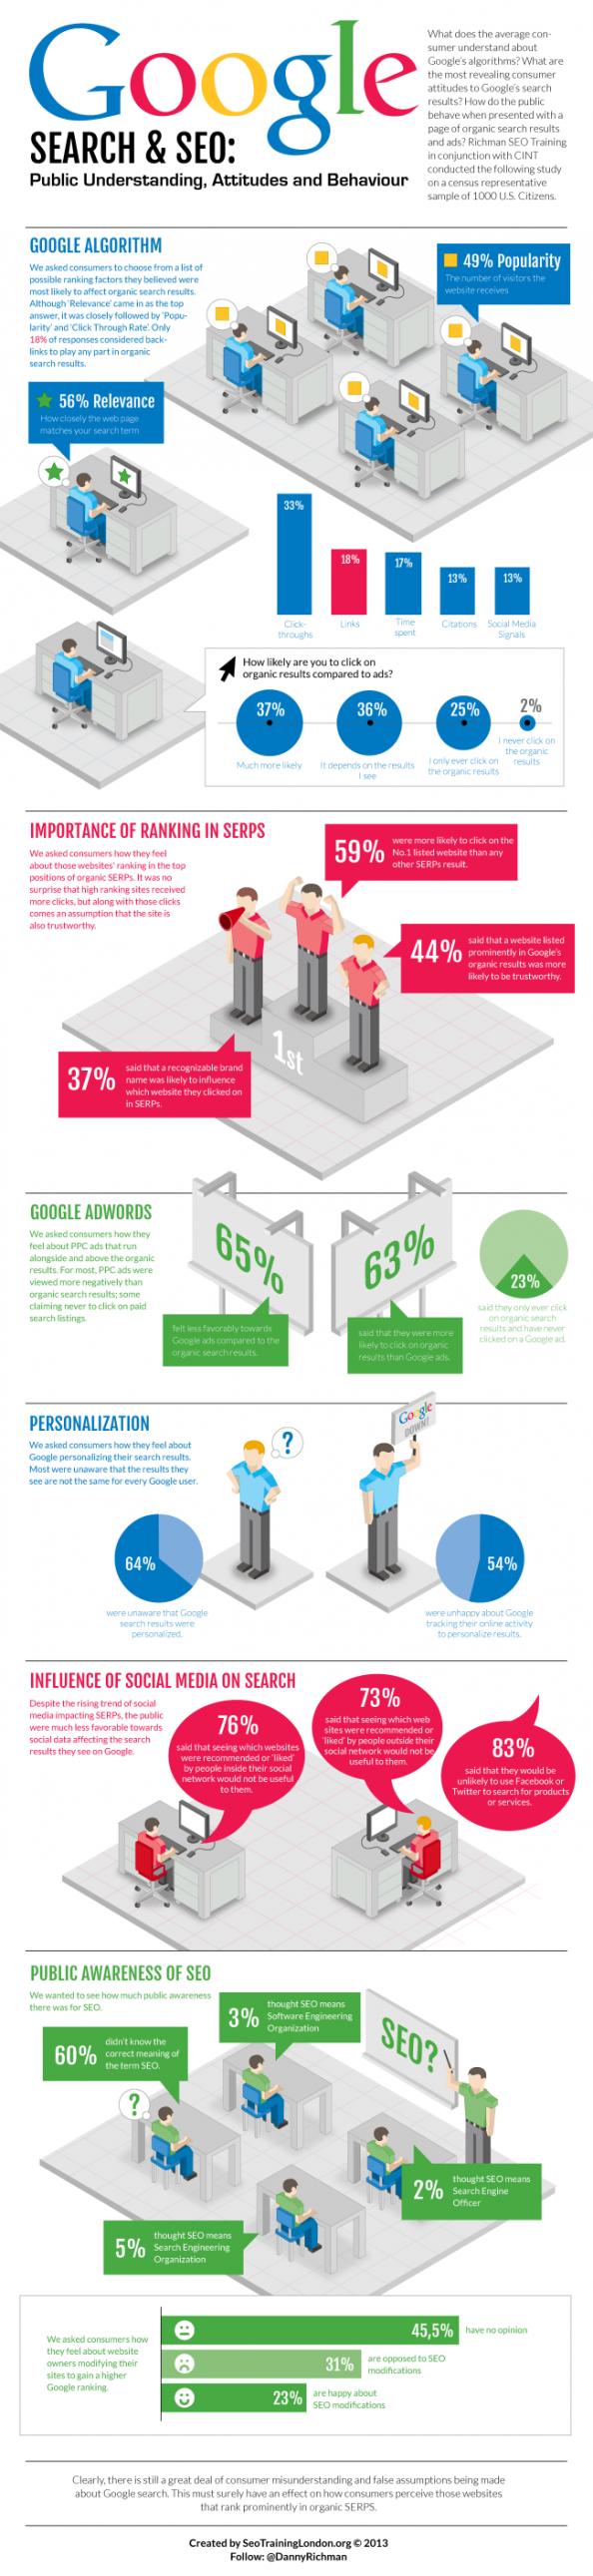 Google Search & SEO : Public Understanding Attitudes and Behavior #Infographic #SEOTips